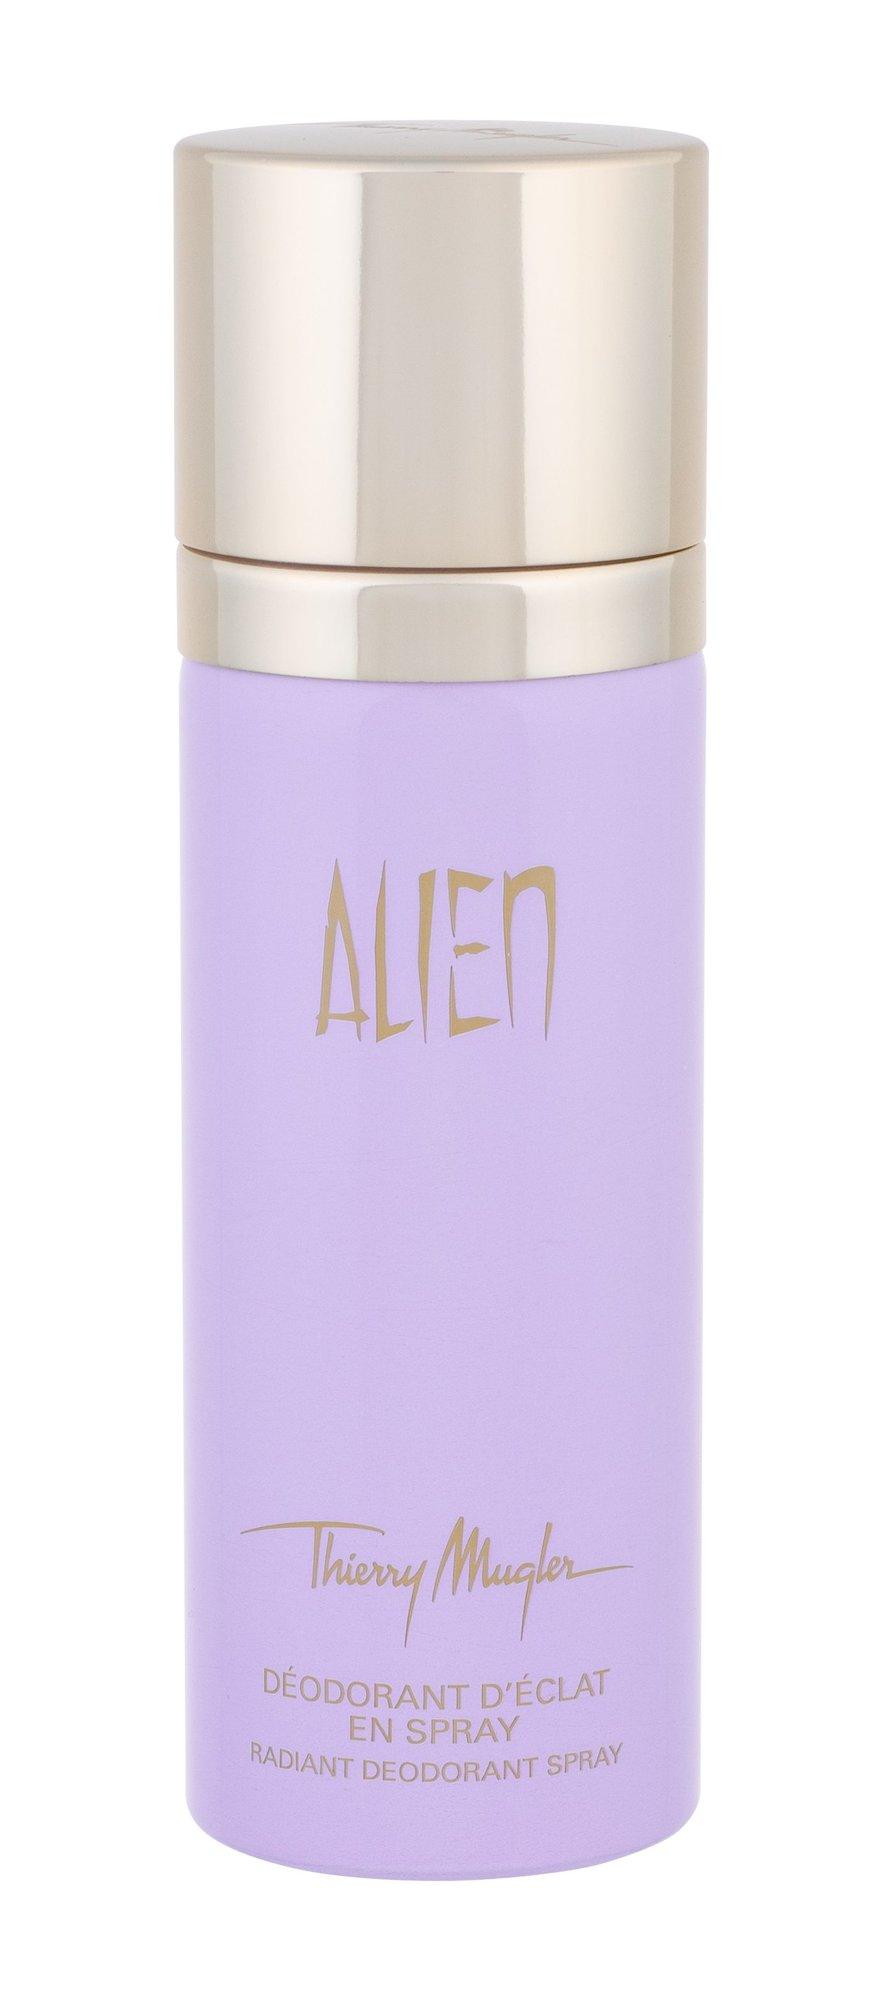 Thierry Mugler Alien Deodorant 100ml